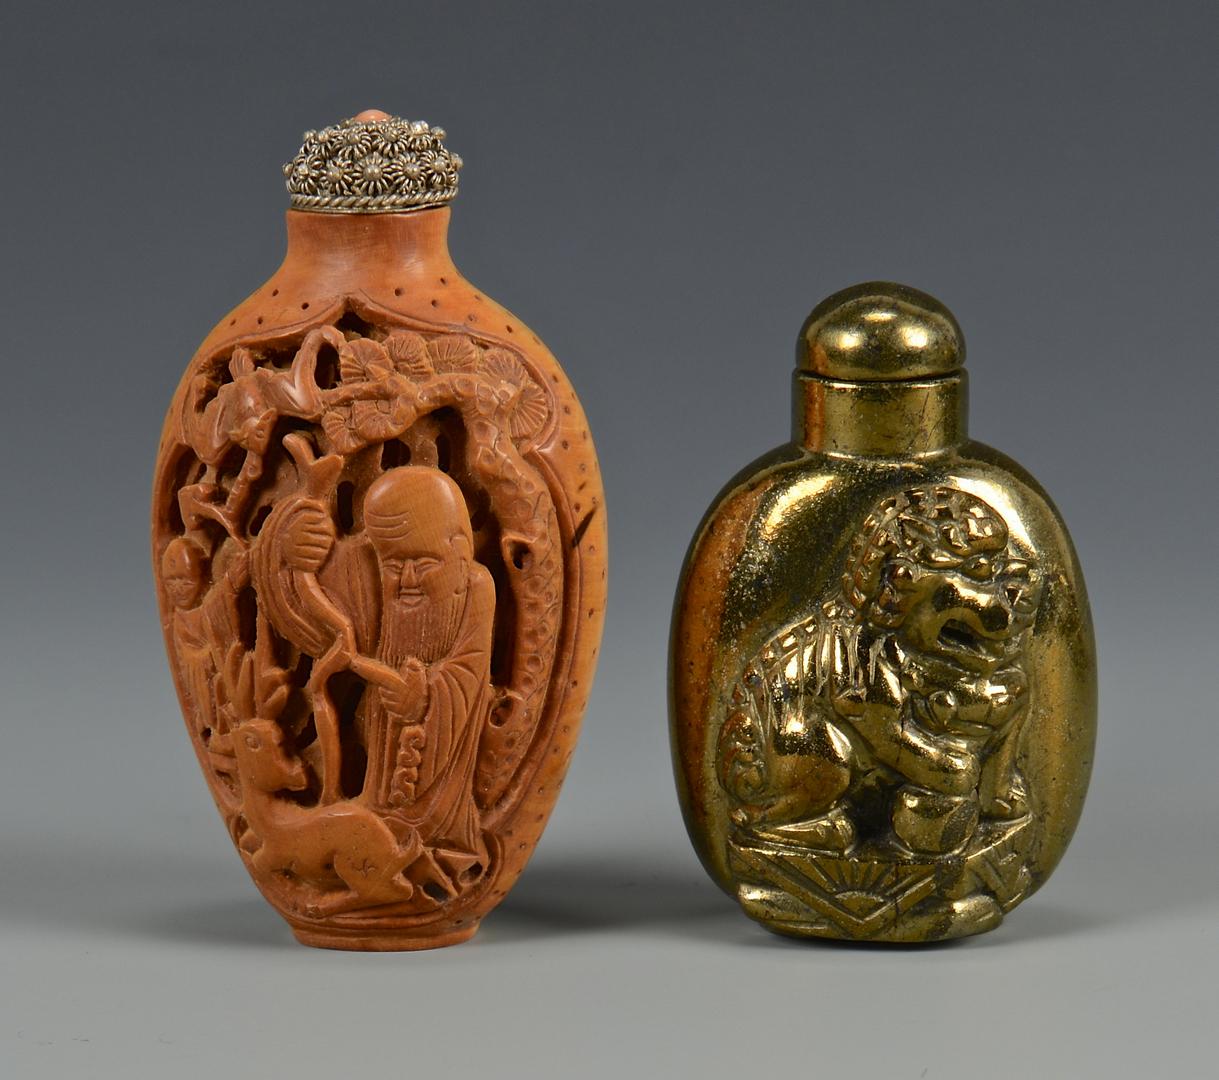 Lot 216: 2 Snuff Bottles & Elephant Figure